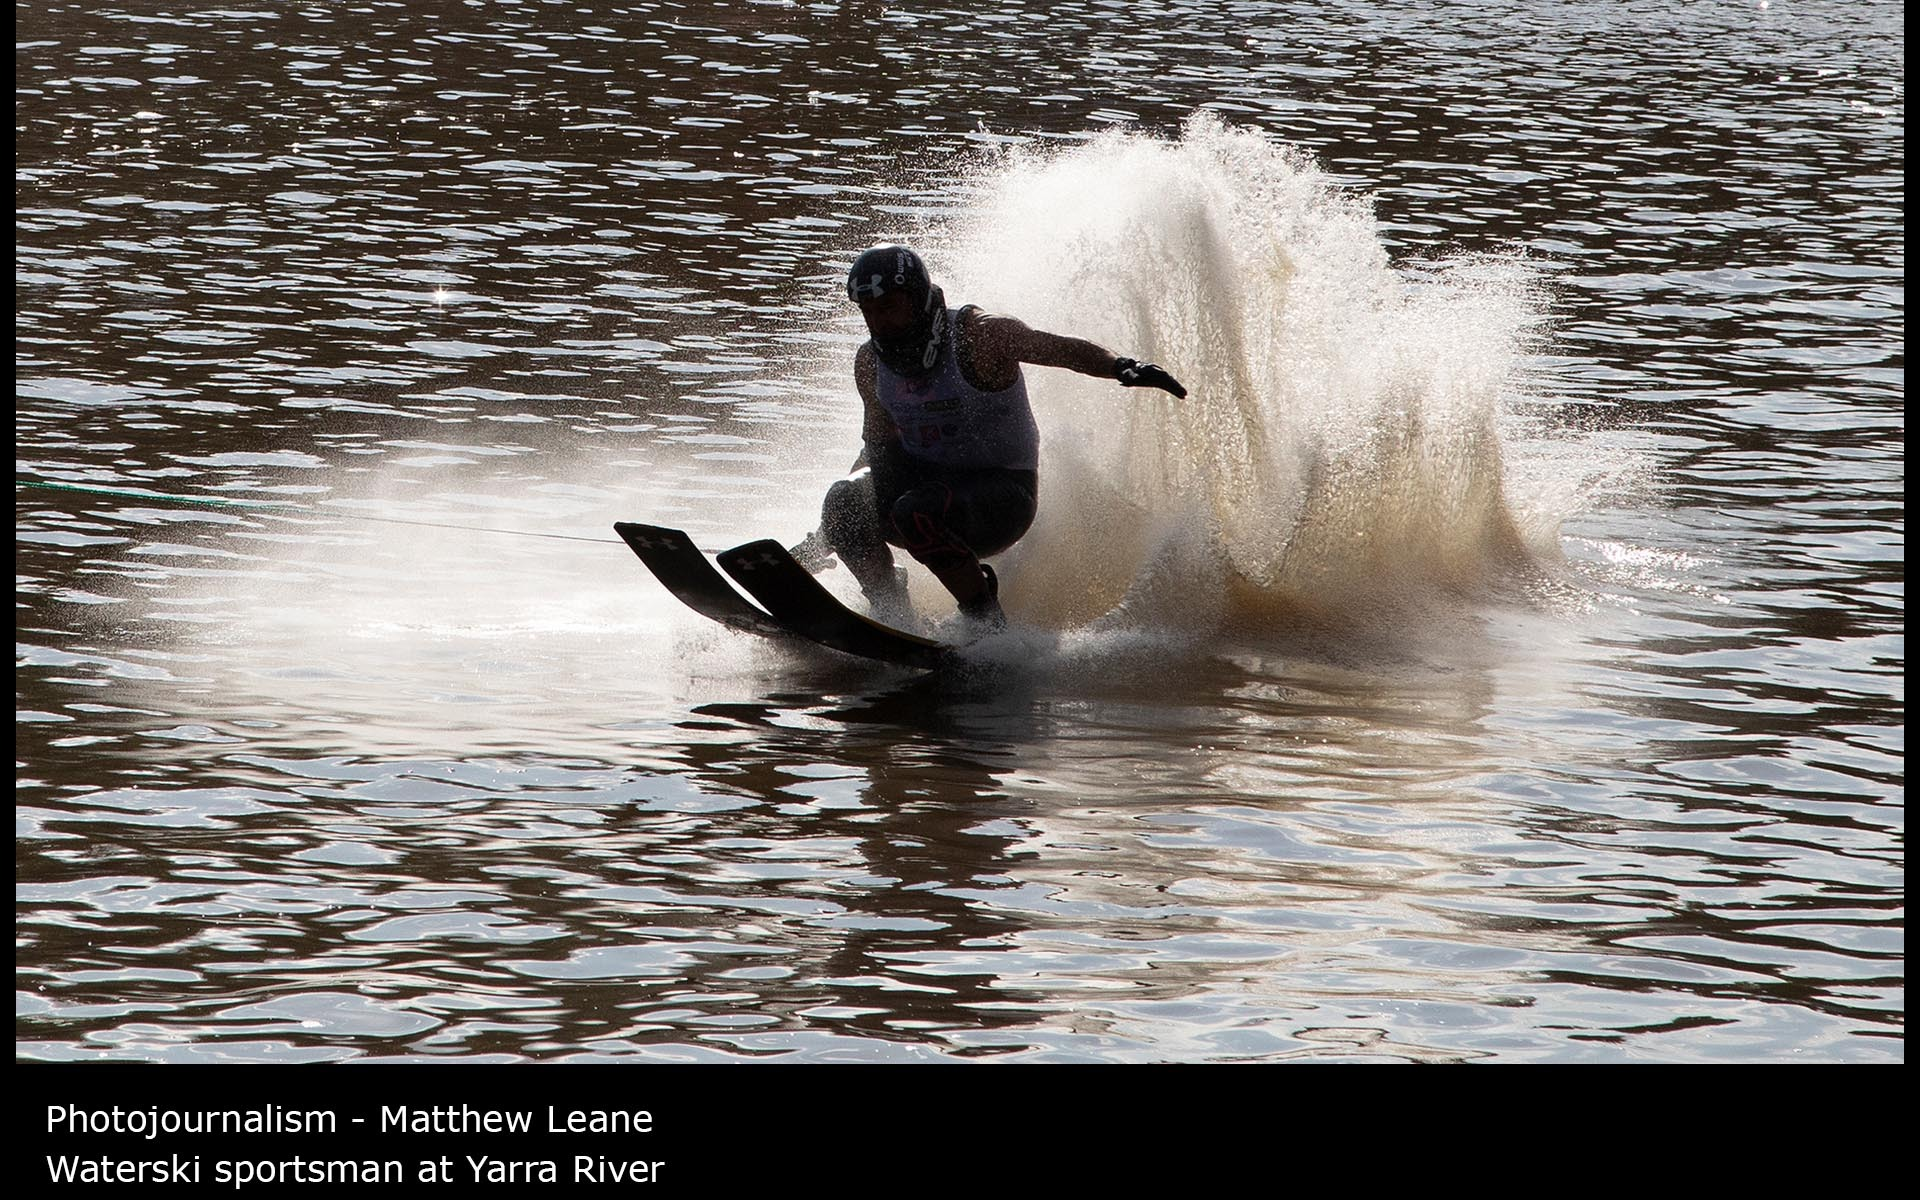 Waterski sportsman at Yarra River - Matthew Leane